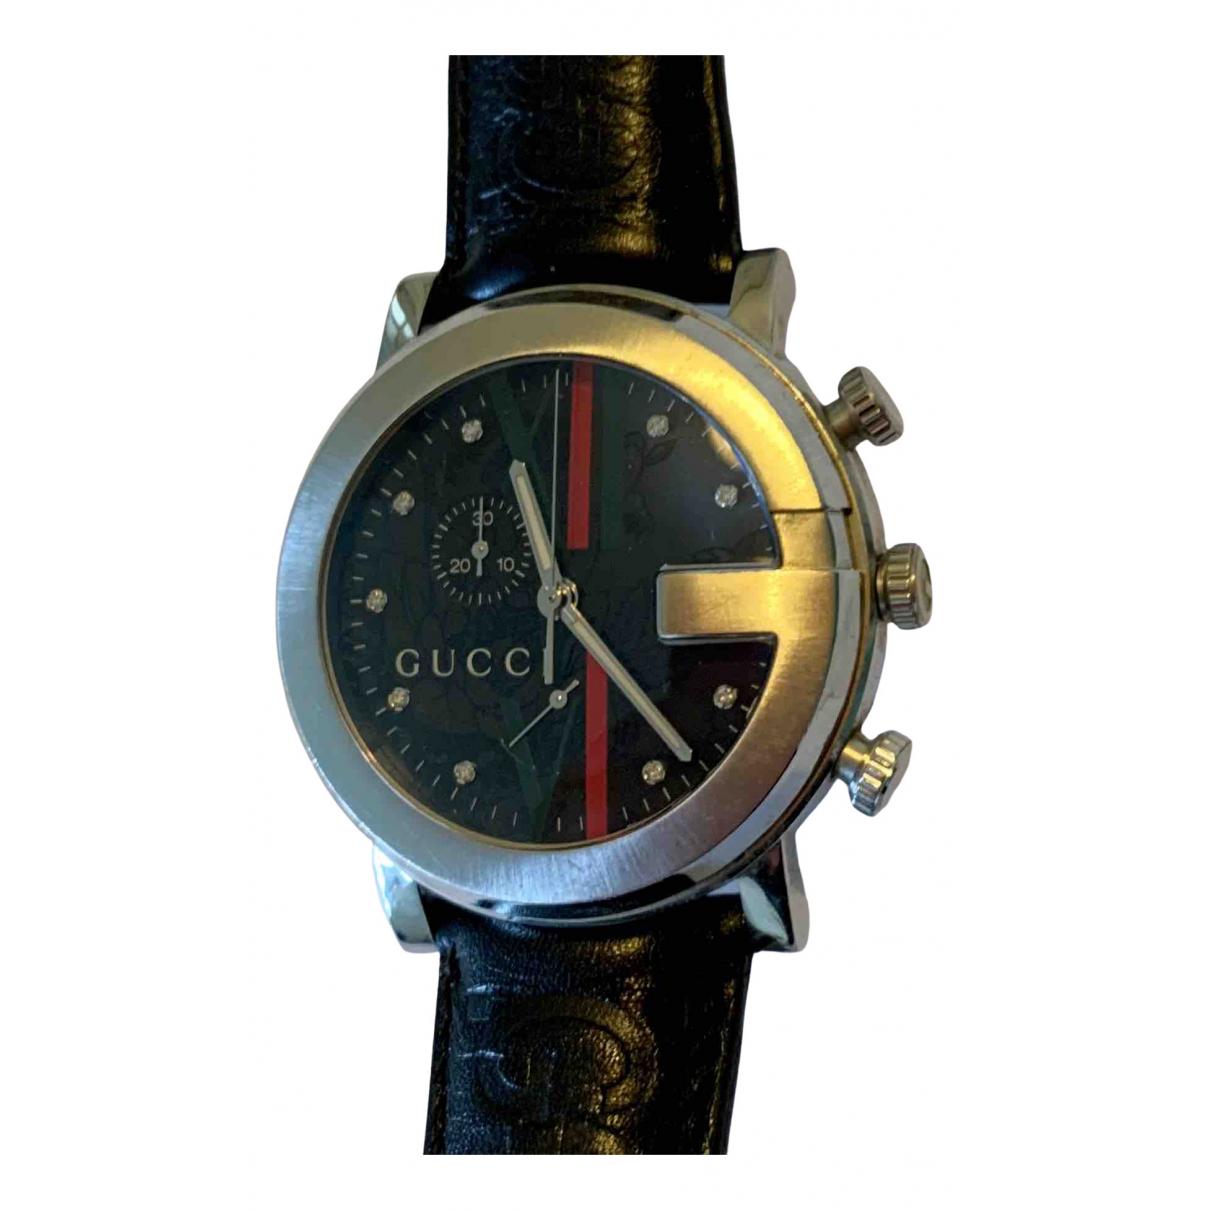 Relojes G-Chrono Gucci